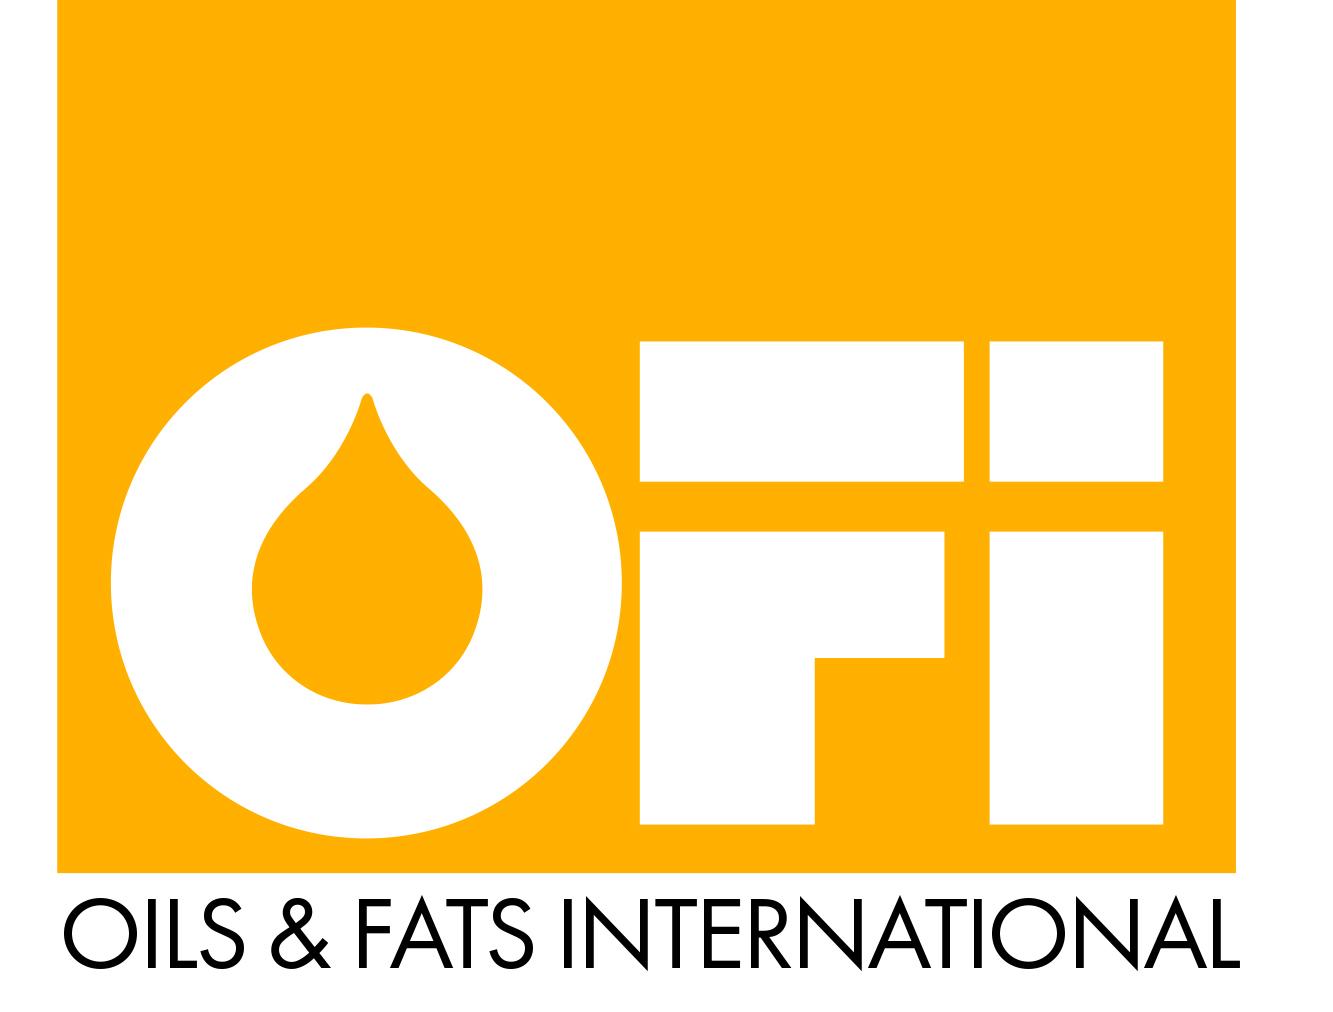 Oil & Fast International